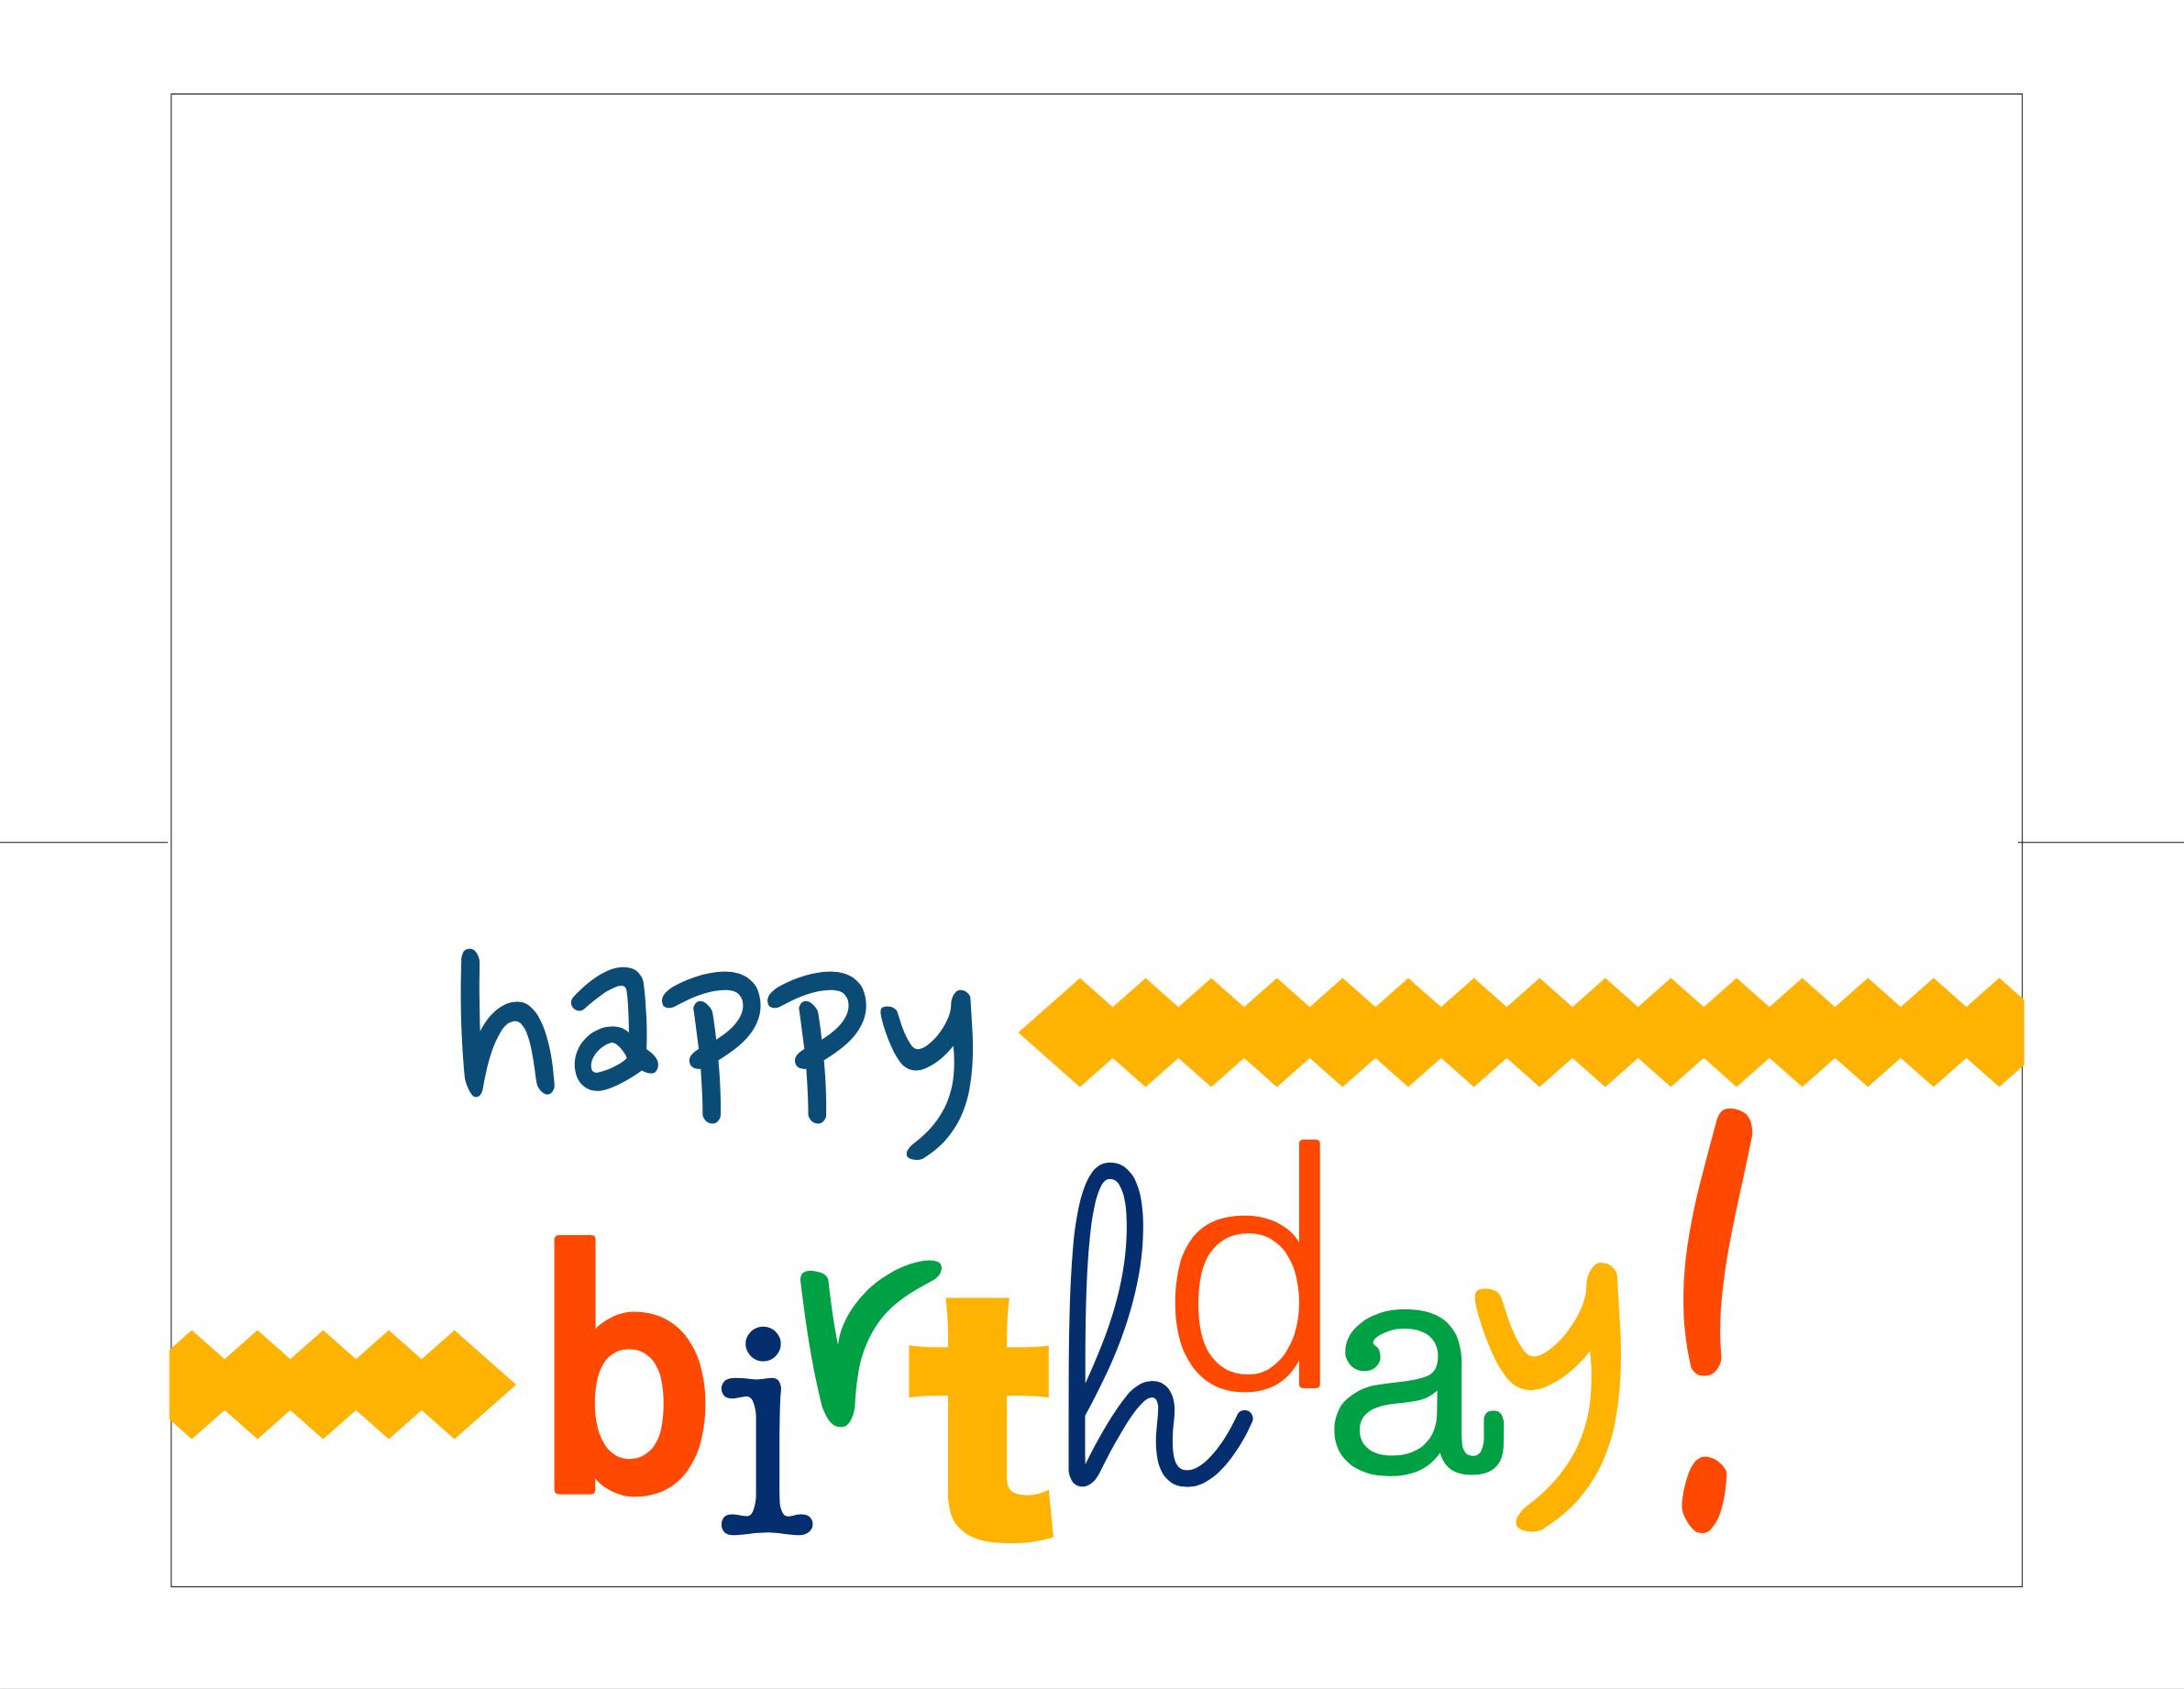 Happy Birthday Card Free Printable - How Do The Jones Do It - Happy Birthday Free Printable